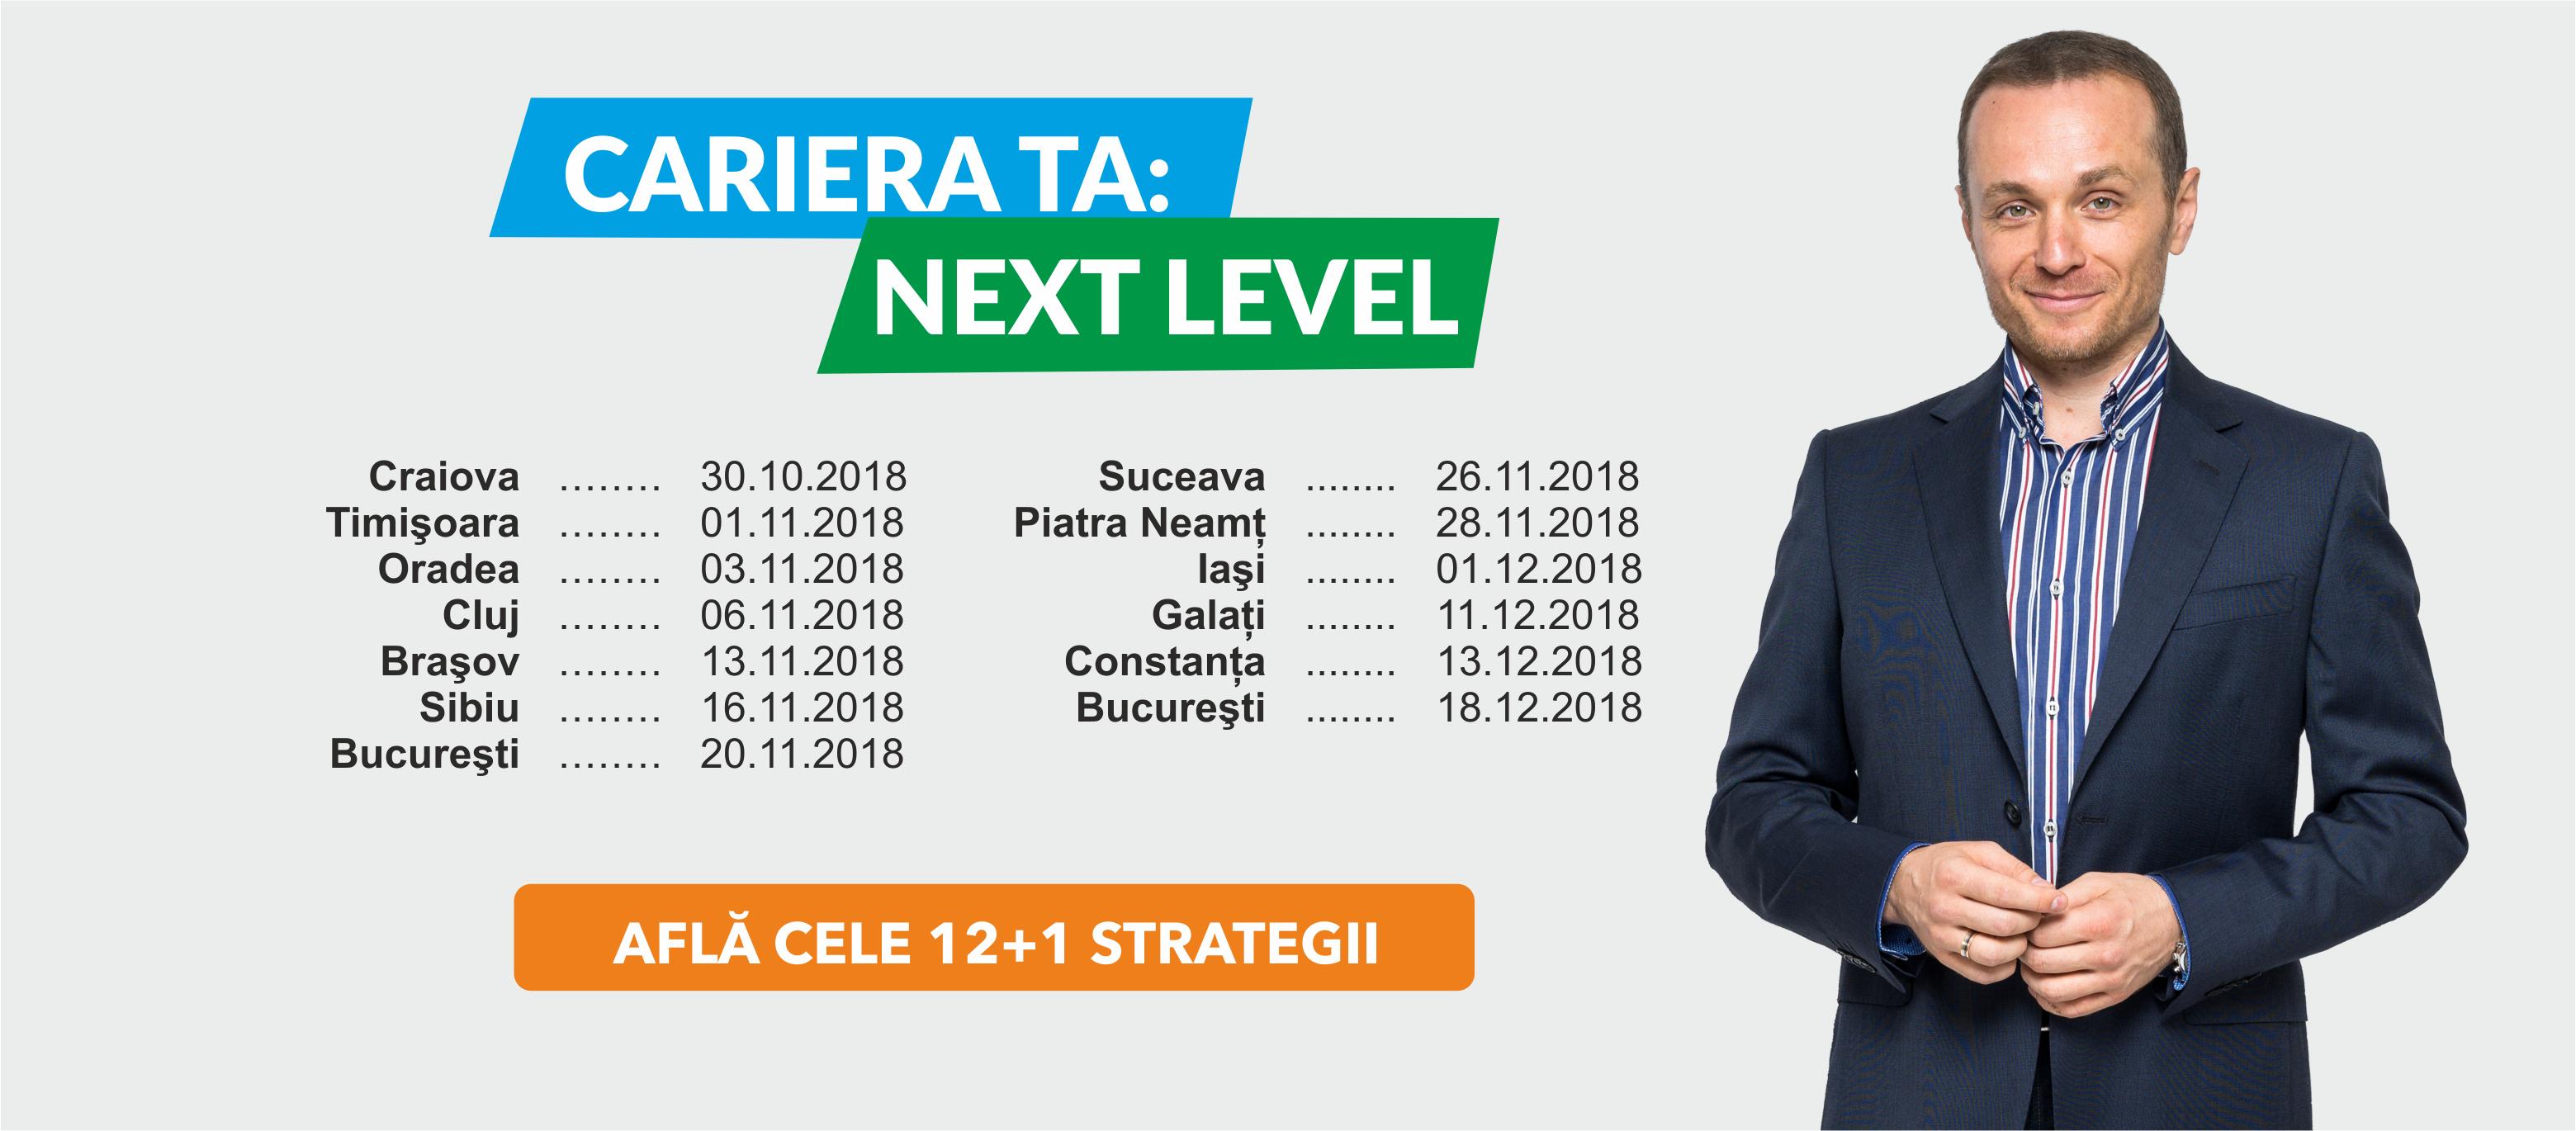 Cariera TA: Next Level